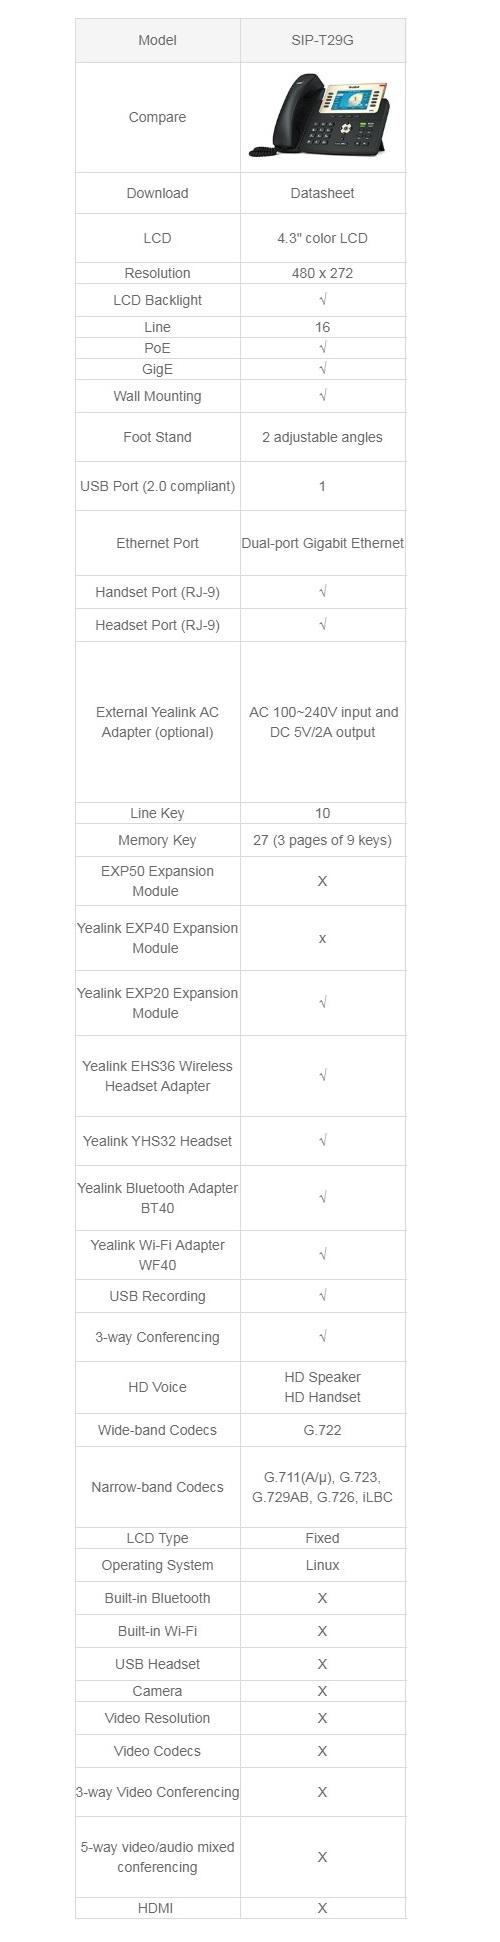 Yealink T29G 6 Line IP Phone 480x272 LCD 27 Program Keys Dual Gigabit Ports USB